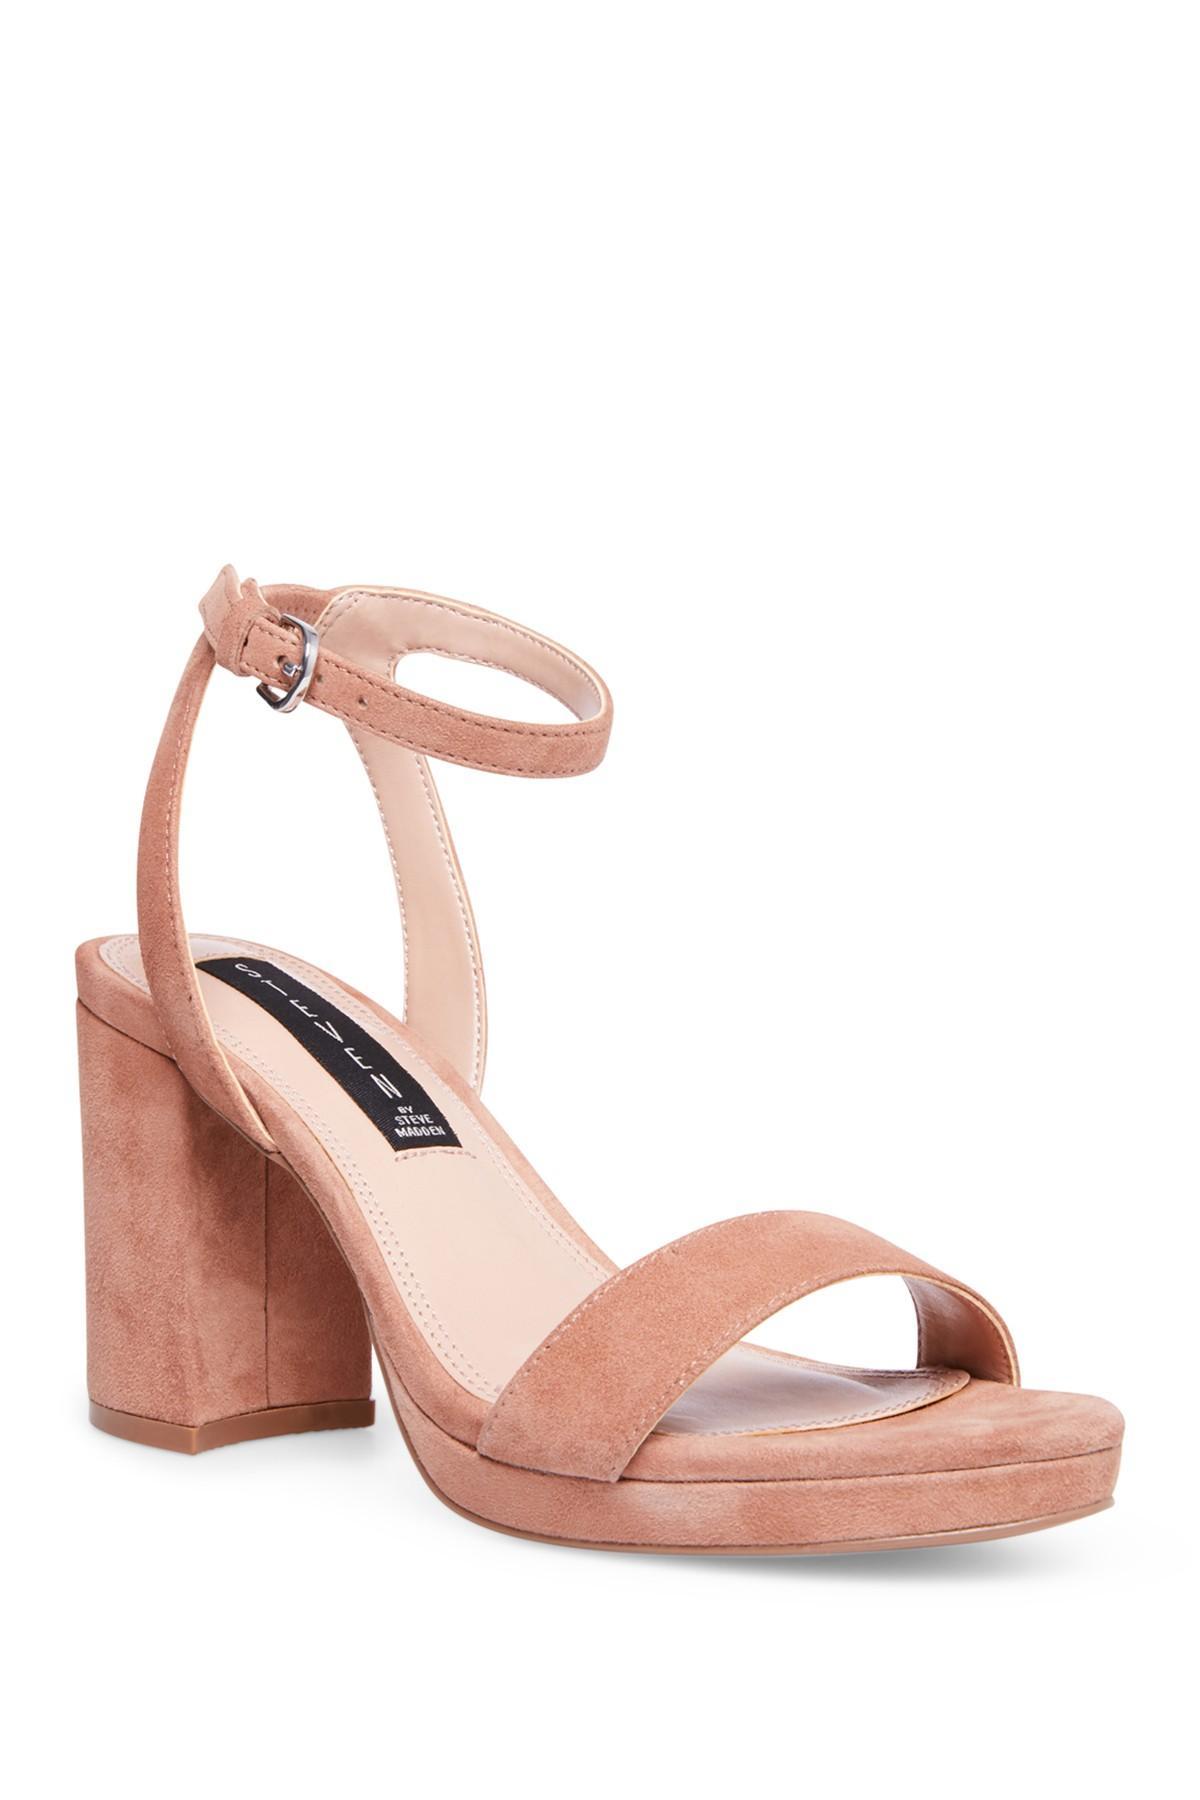 0b1caf3906a Women's Viga Suede Block Heel Sandal